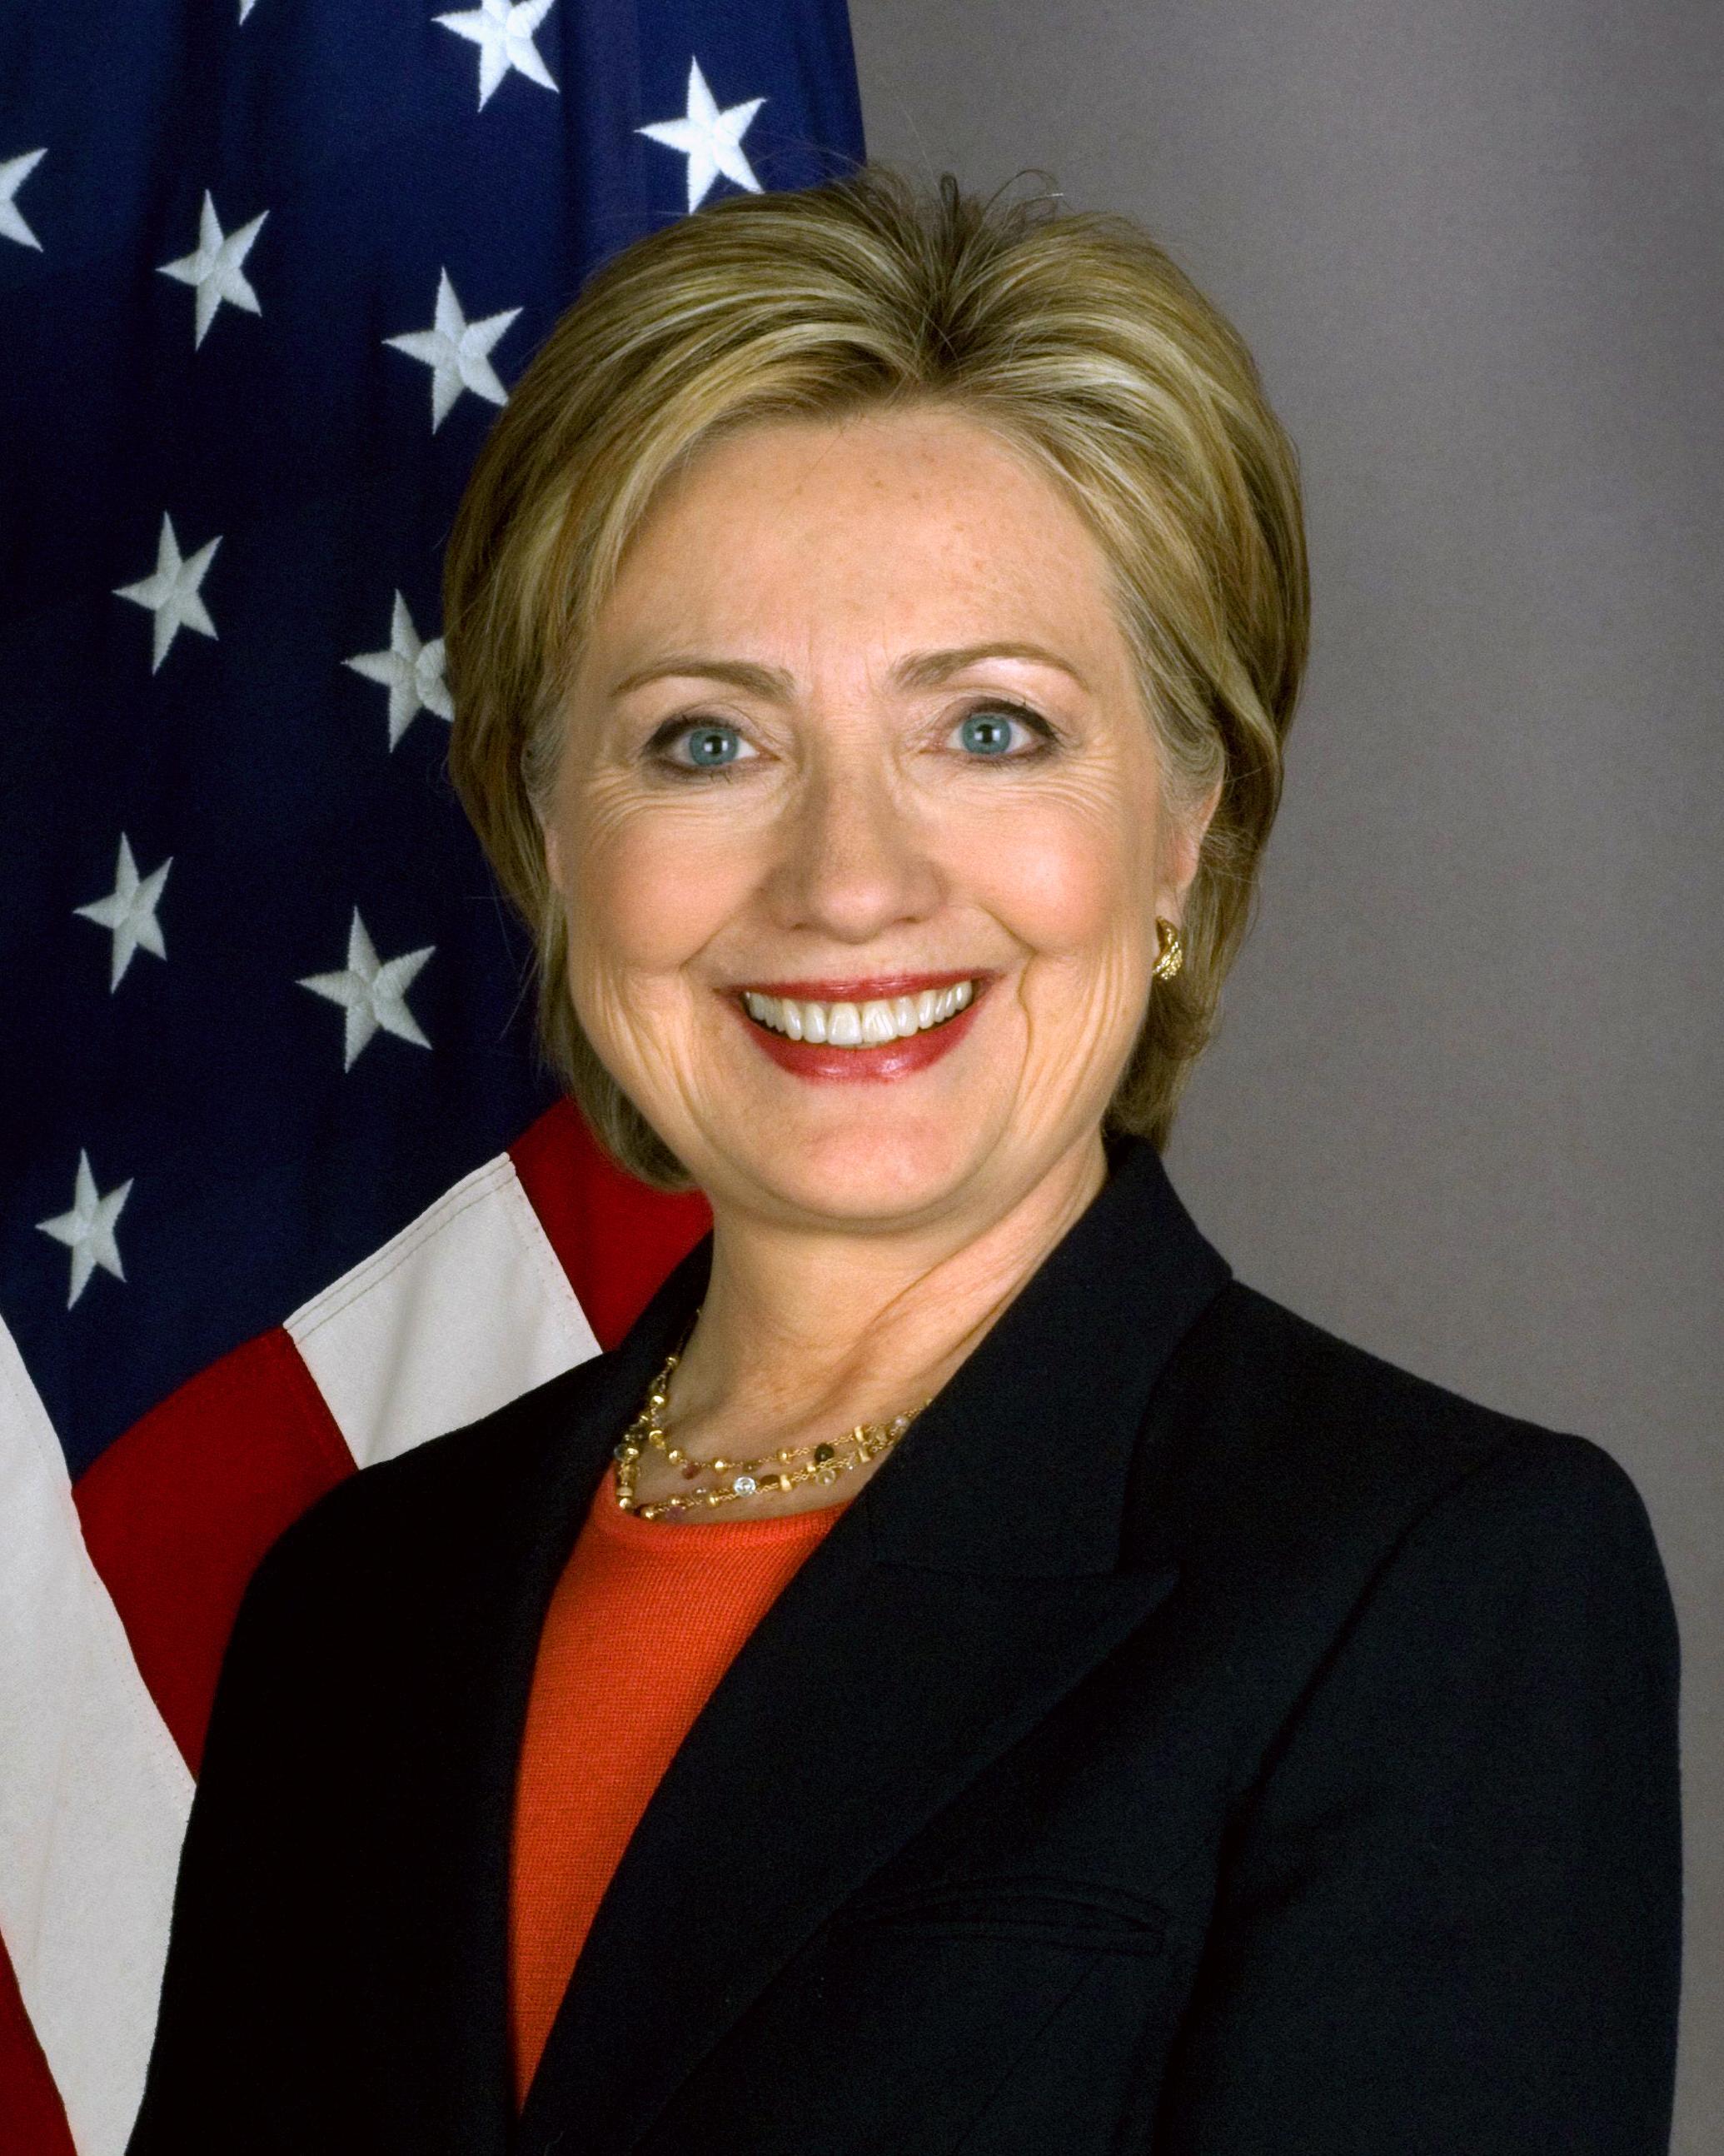 Hillary Clinton Happy Political meme template blank